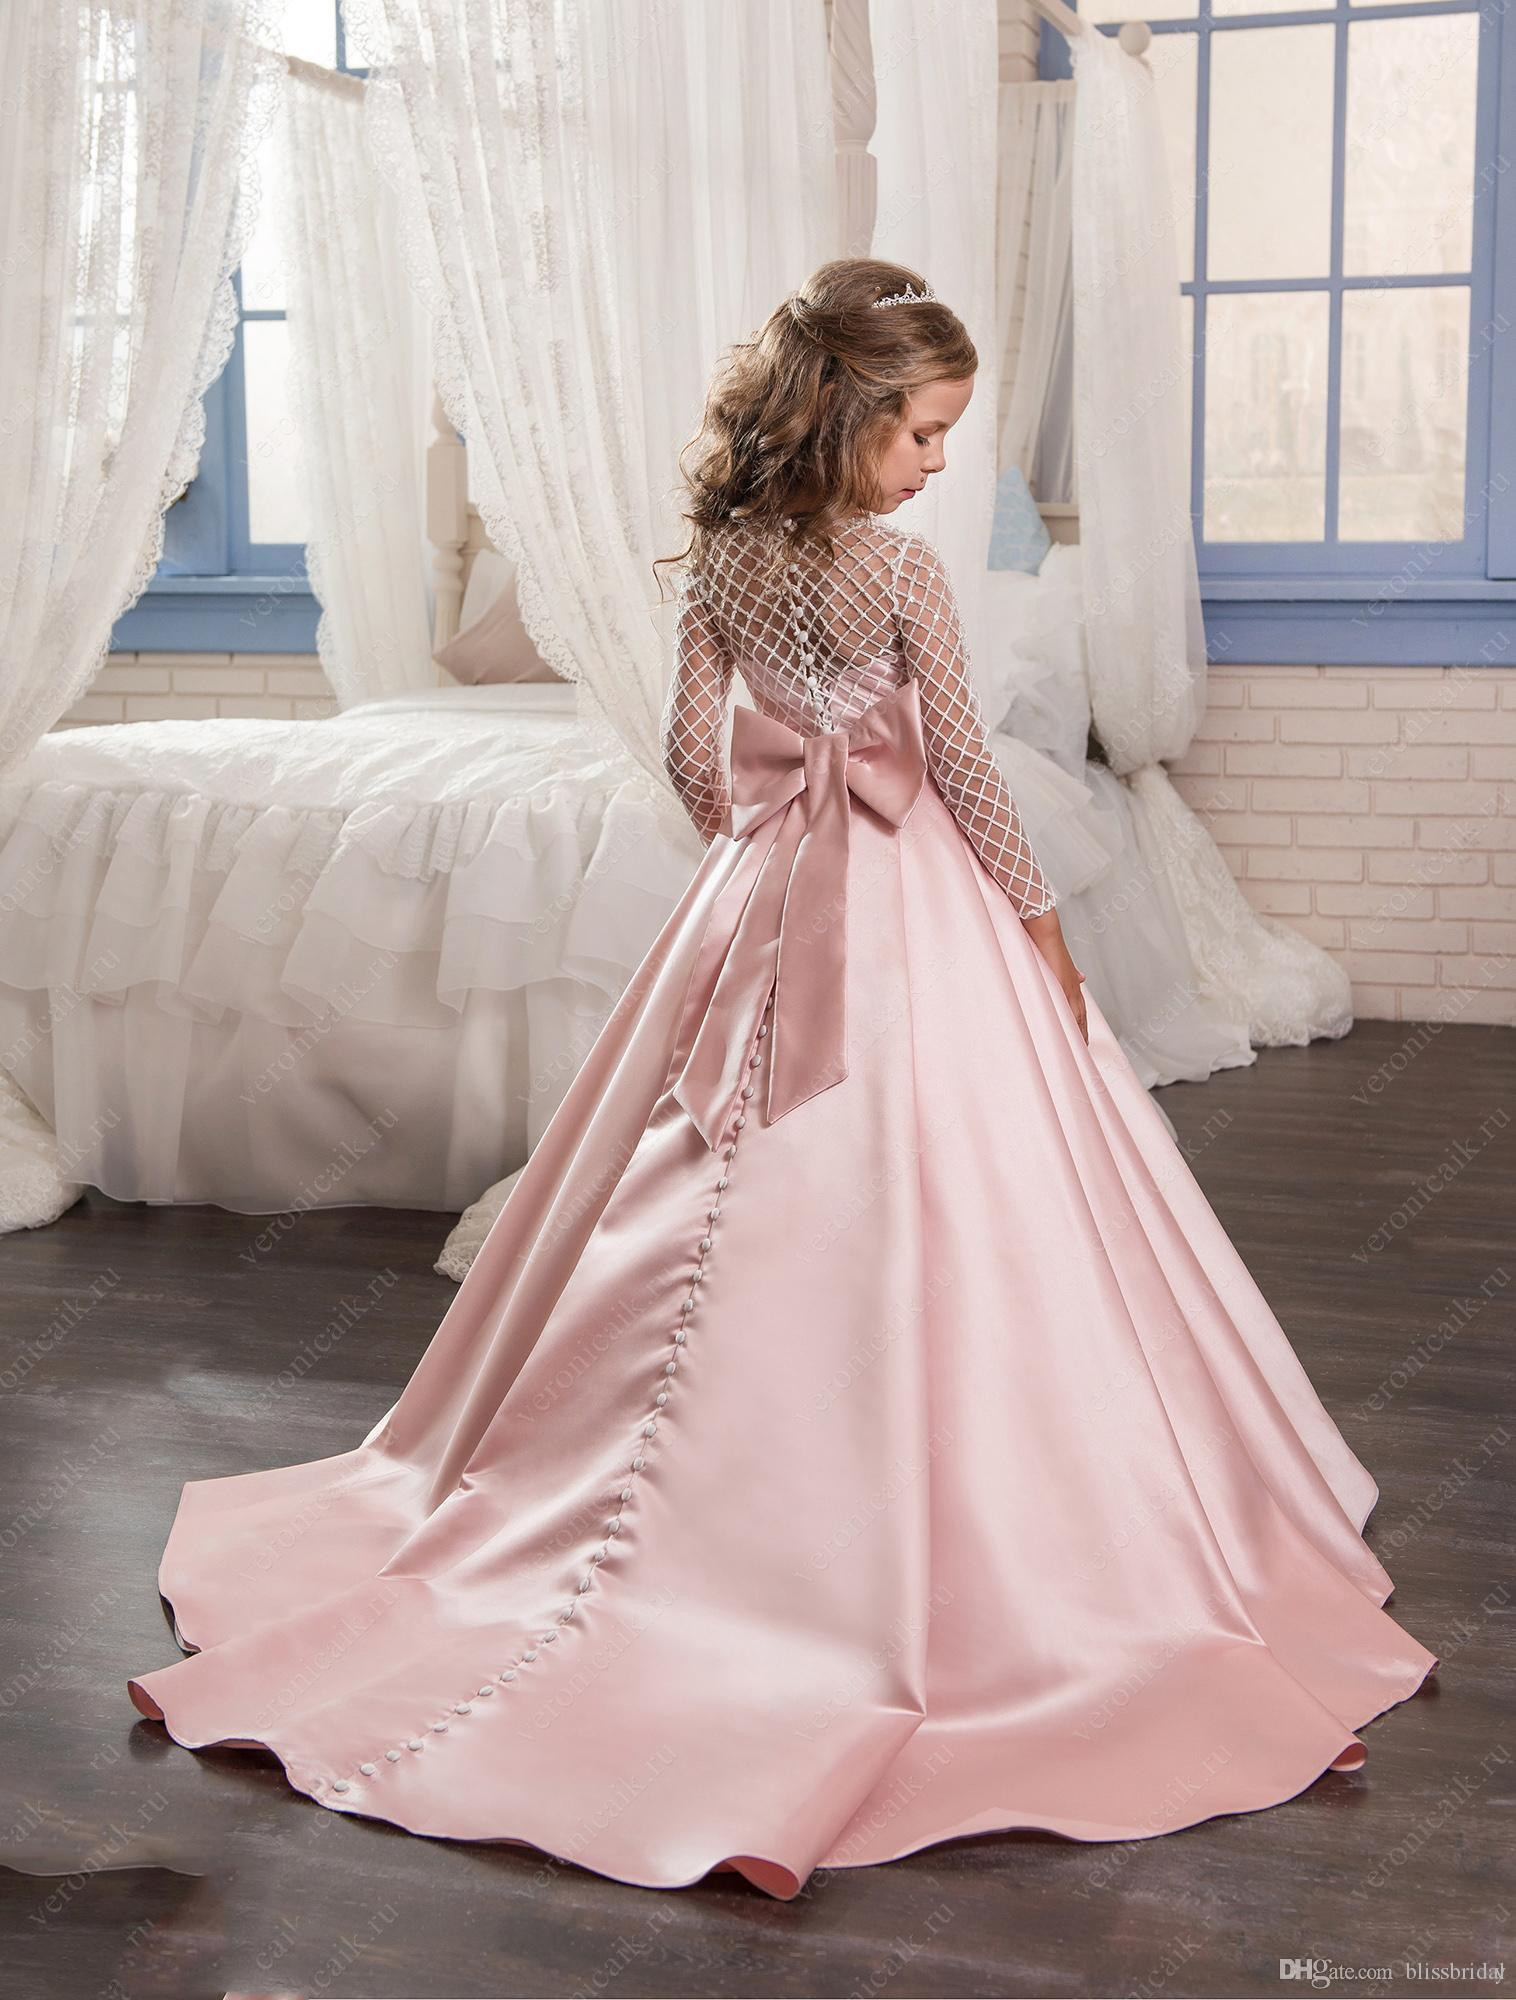 Großhandel Rosa Farbe Blumenmädchenkleider 2017 Satin